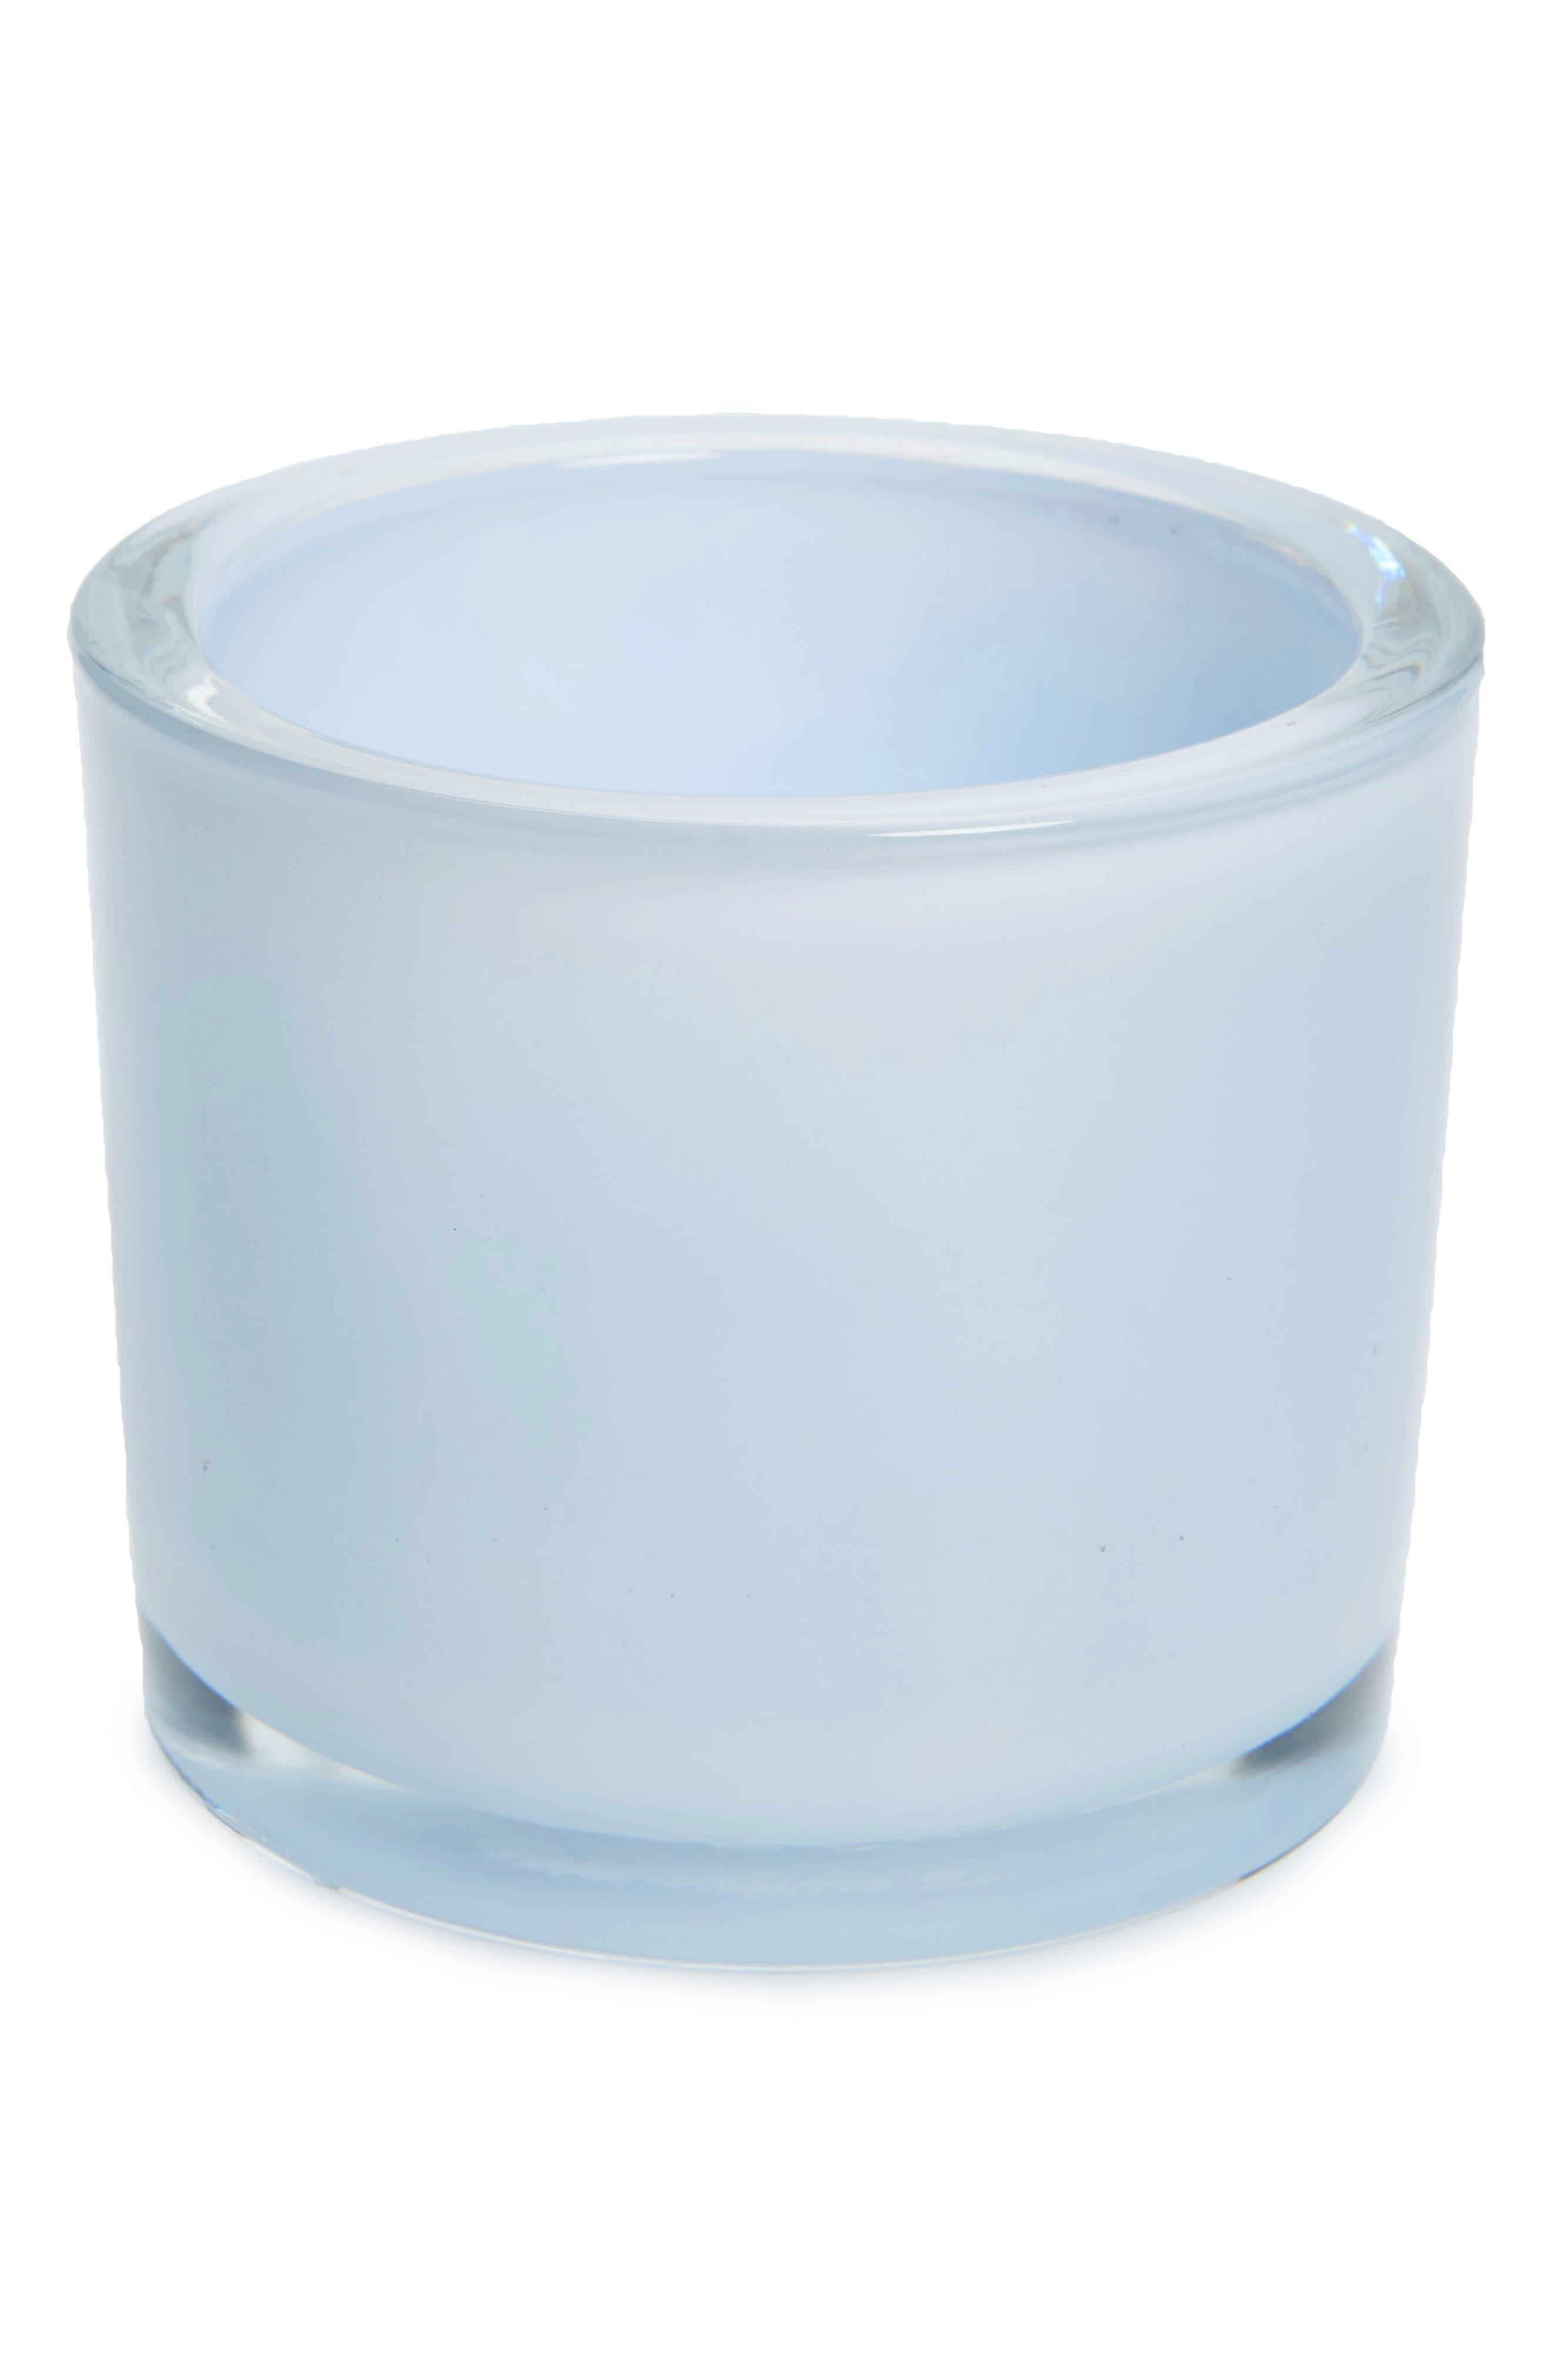 Main Image - Design Imports Blue Glass Votive Holder